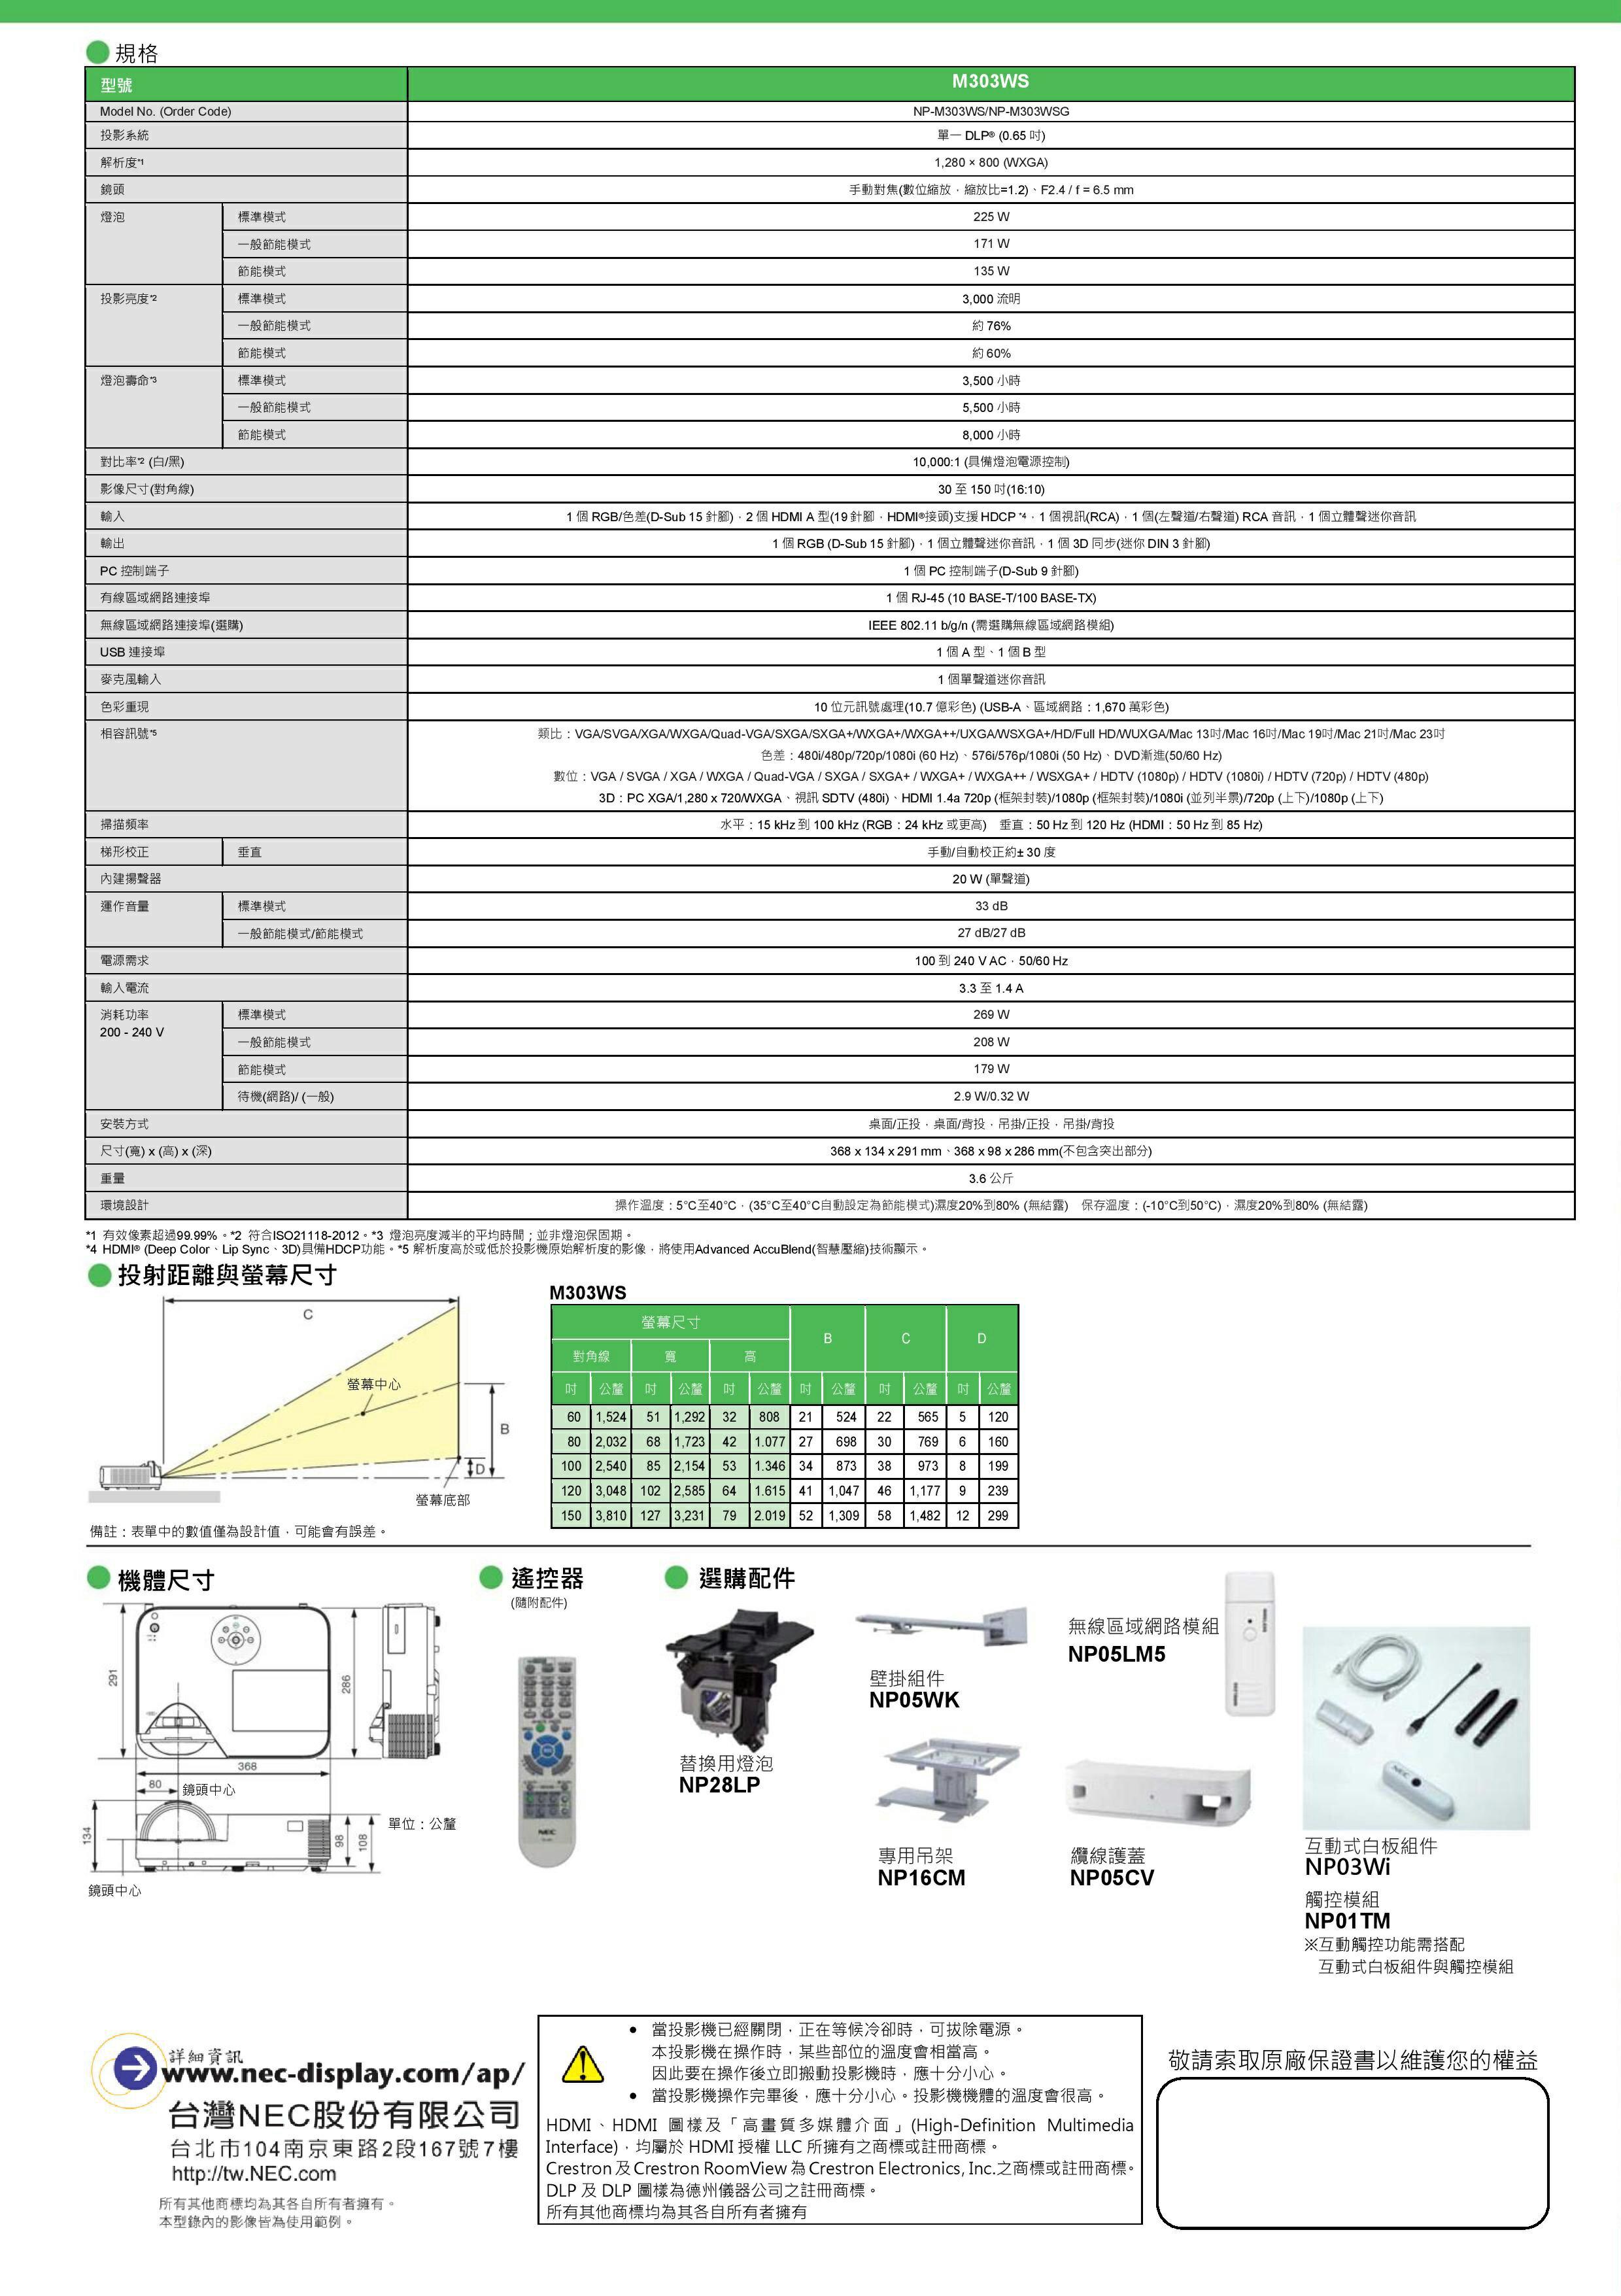 AviewS-NEC M303WS投影機/3000流明/WXGA/多功能短焦投影機/DLP 1